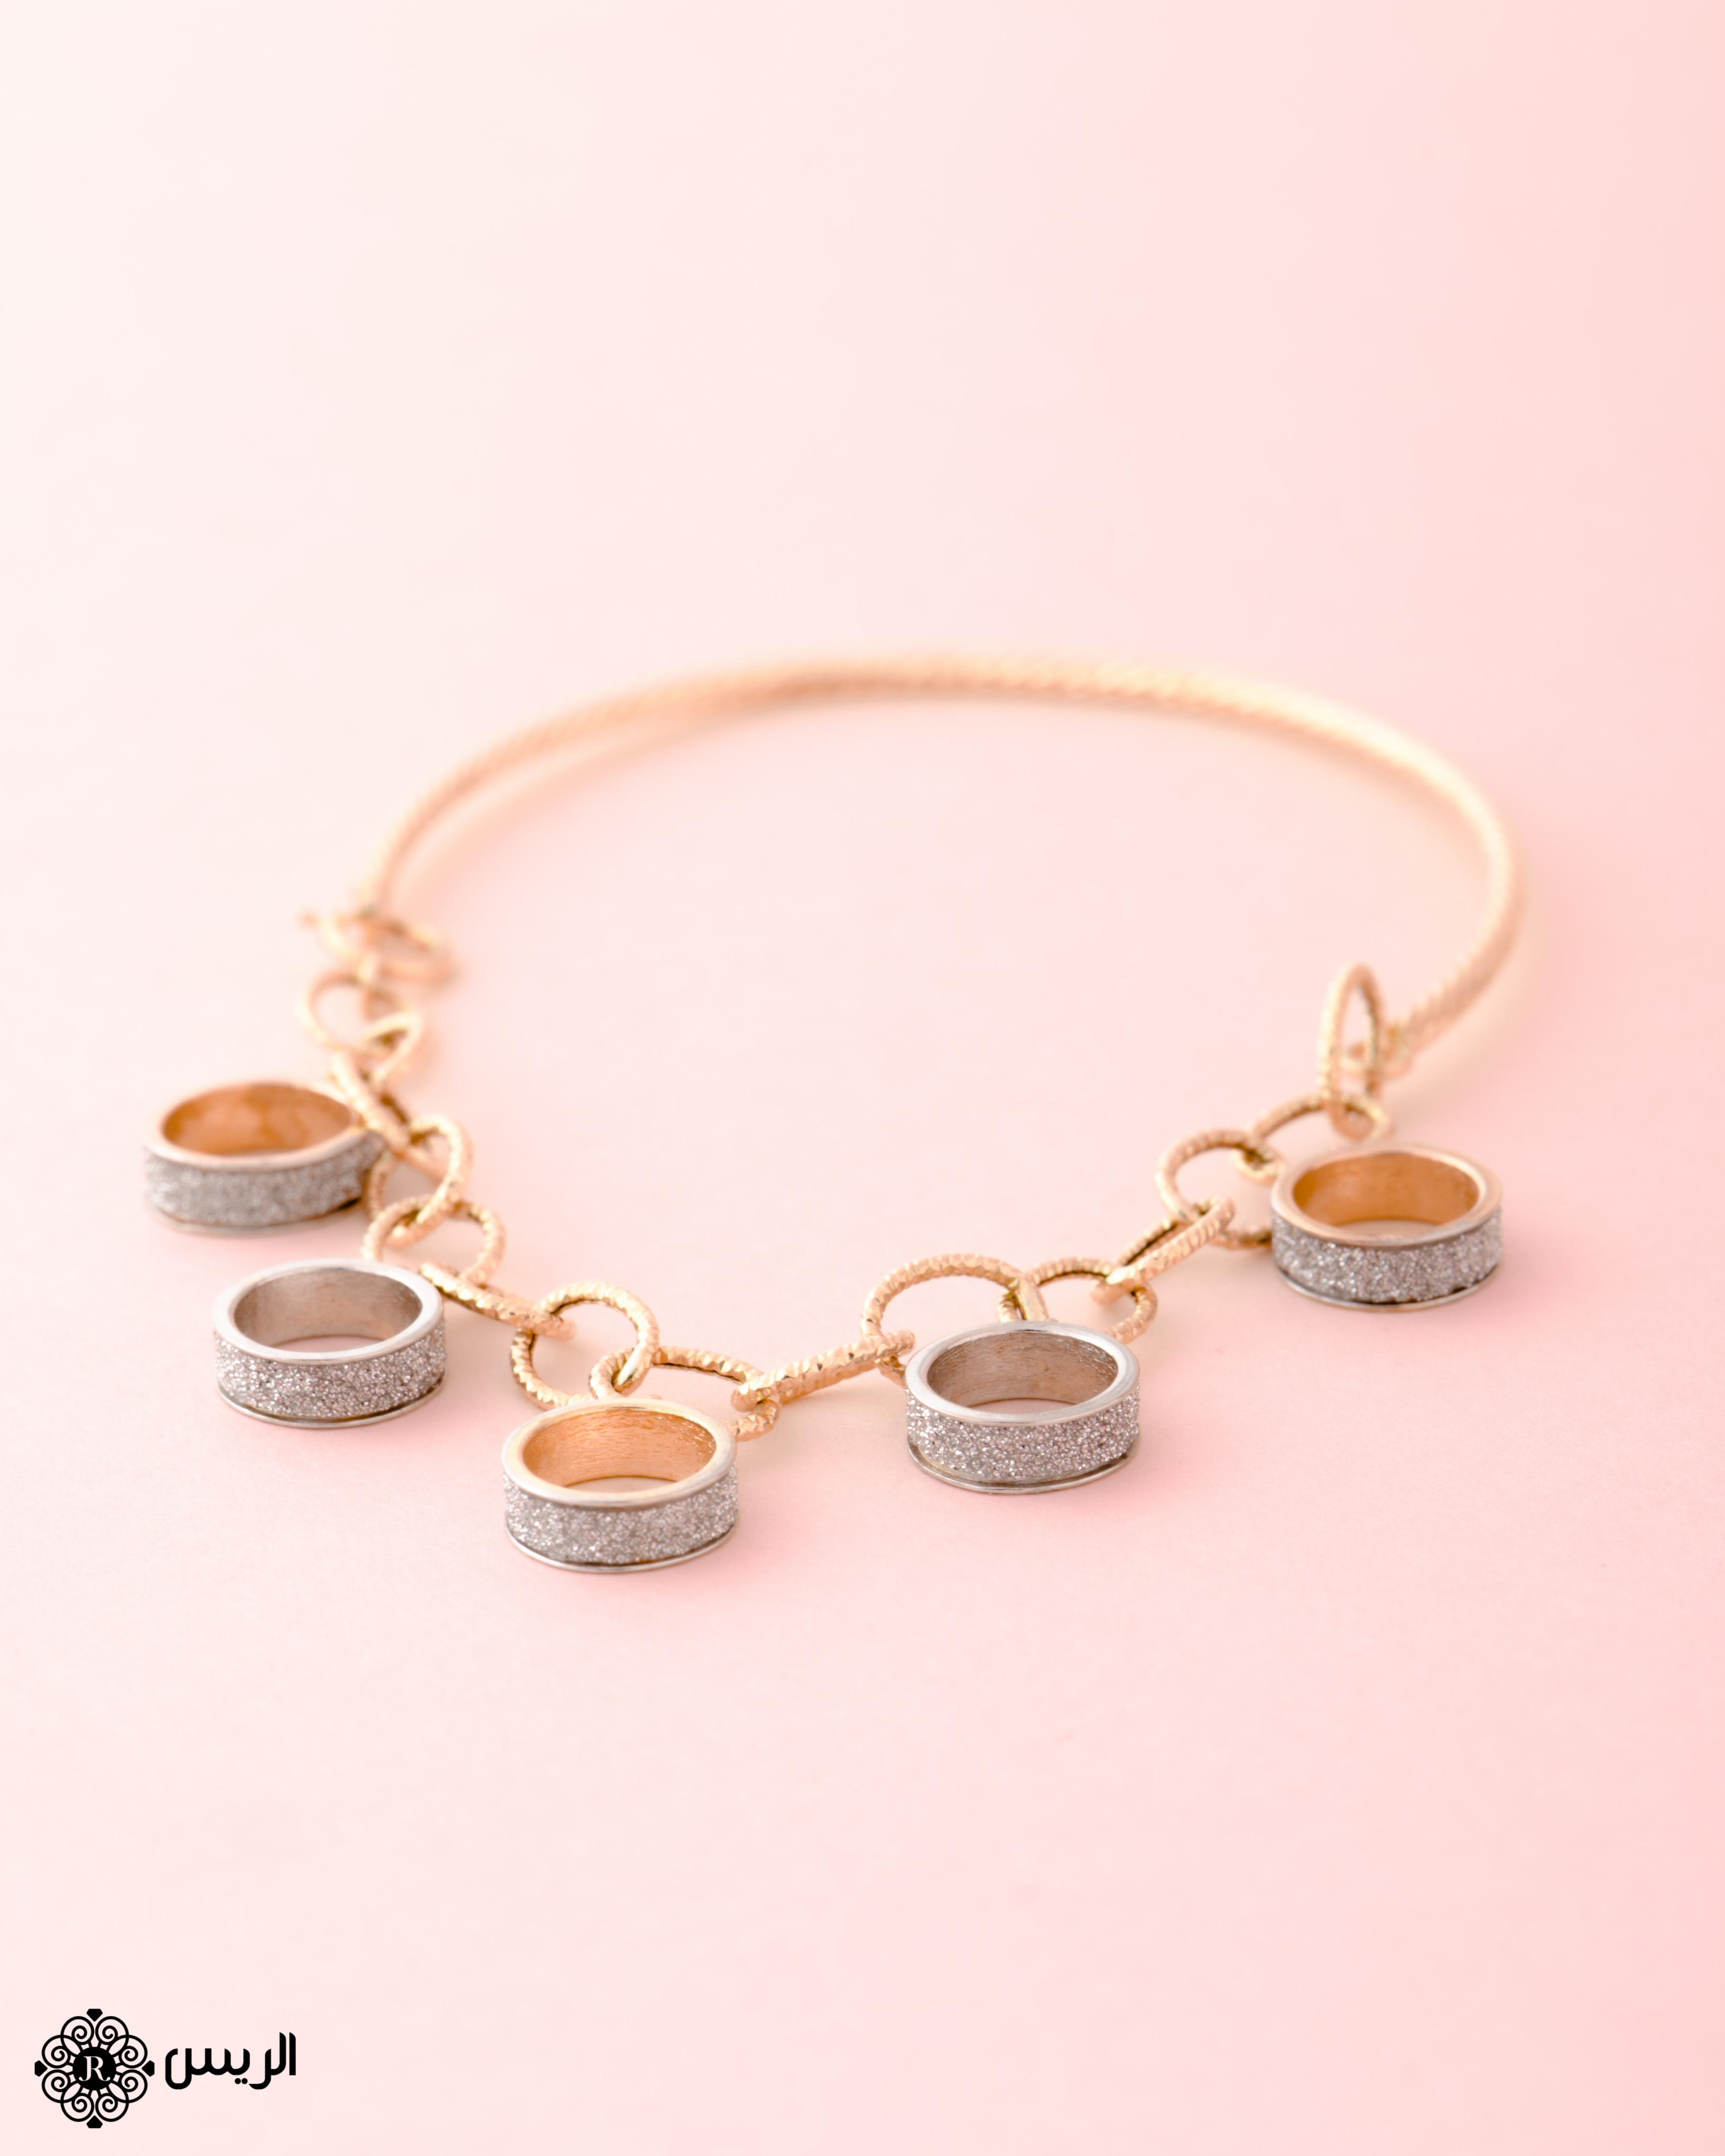 Raies jewelry Kids Bangle Italian إسورة أطفال إيطالي الريس للمجوهرات